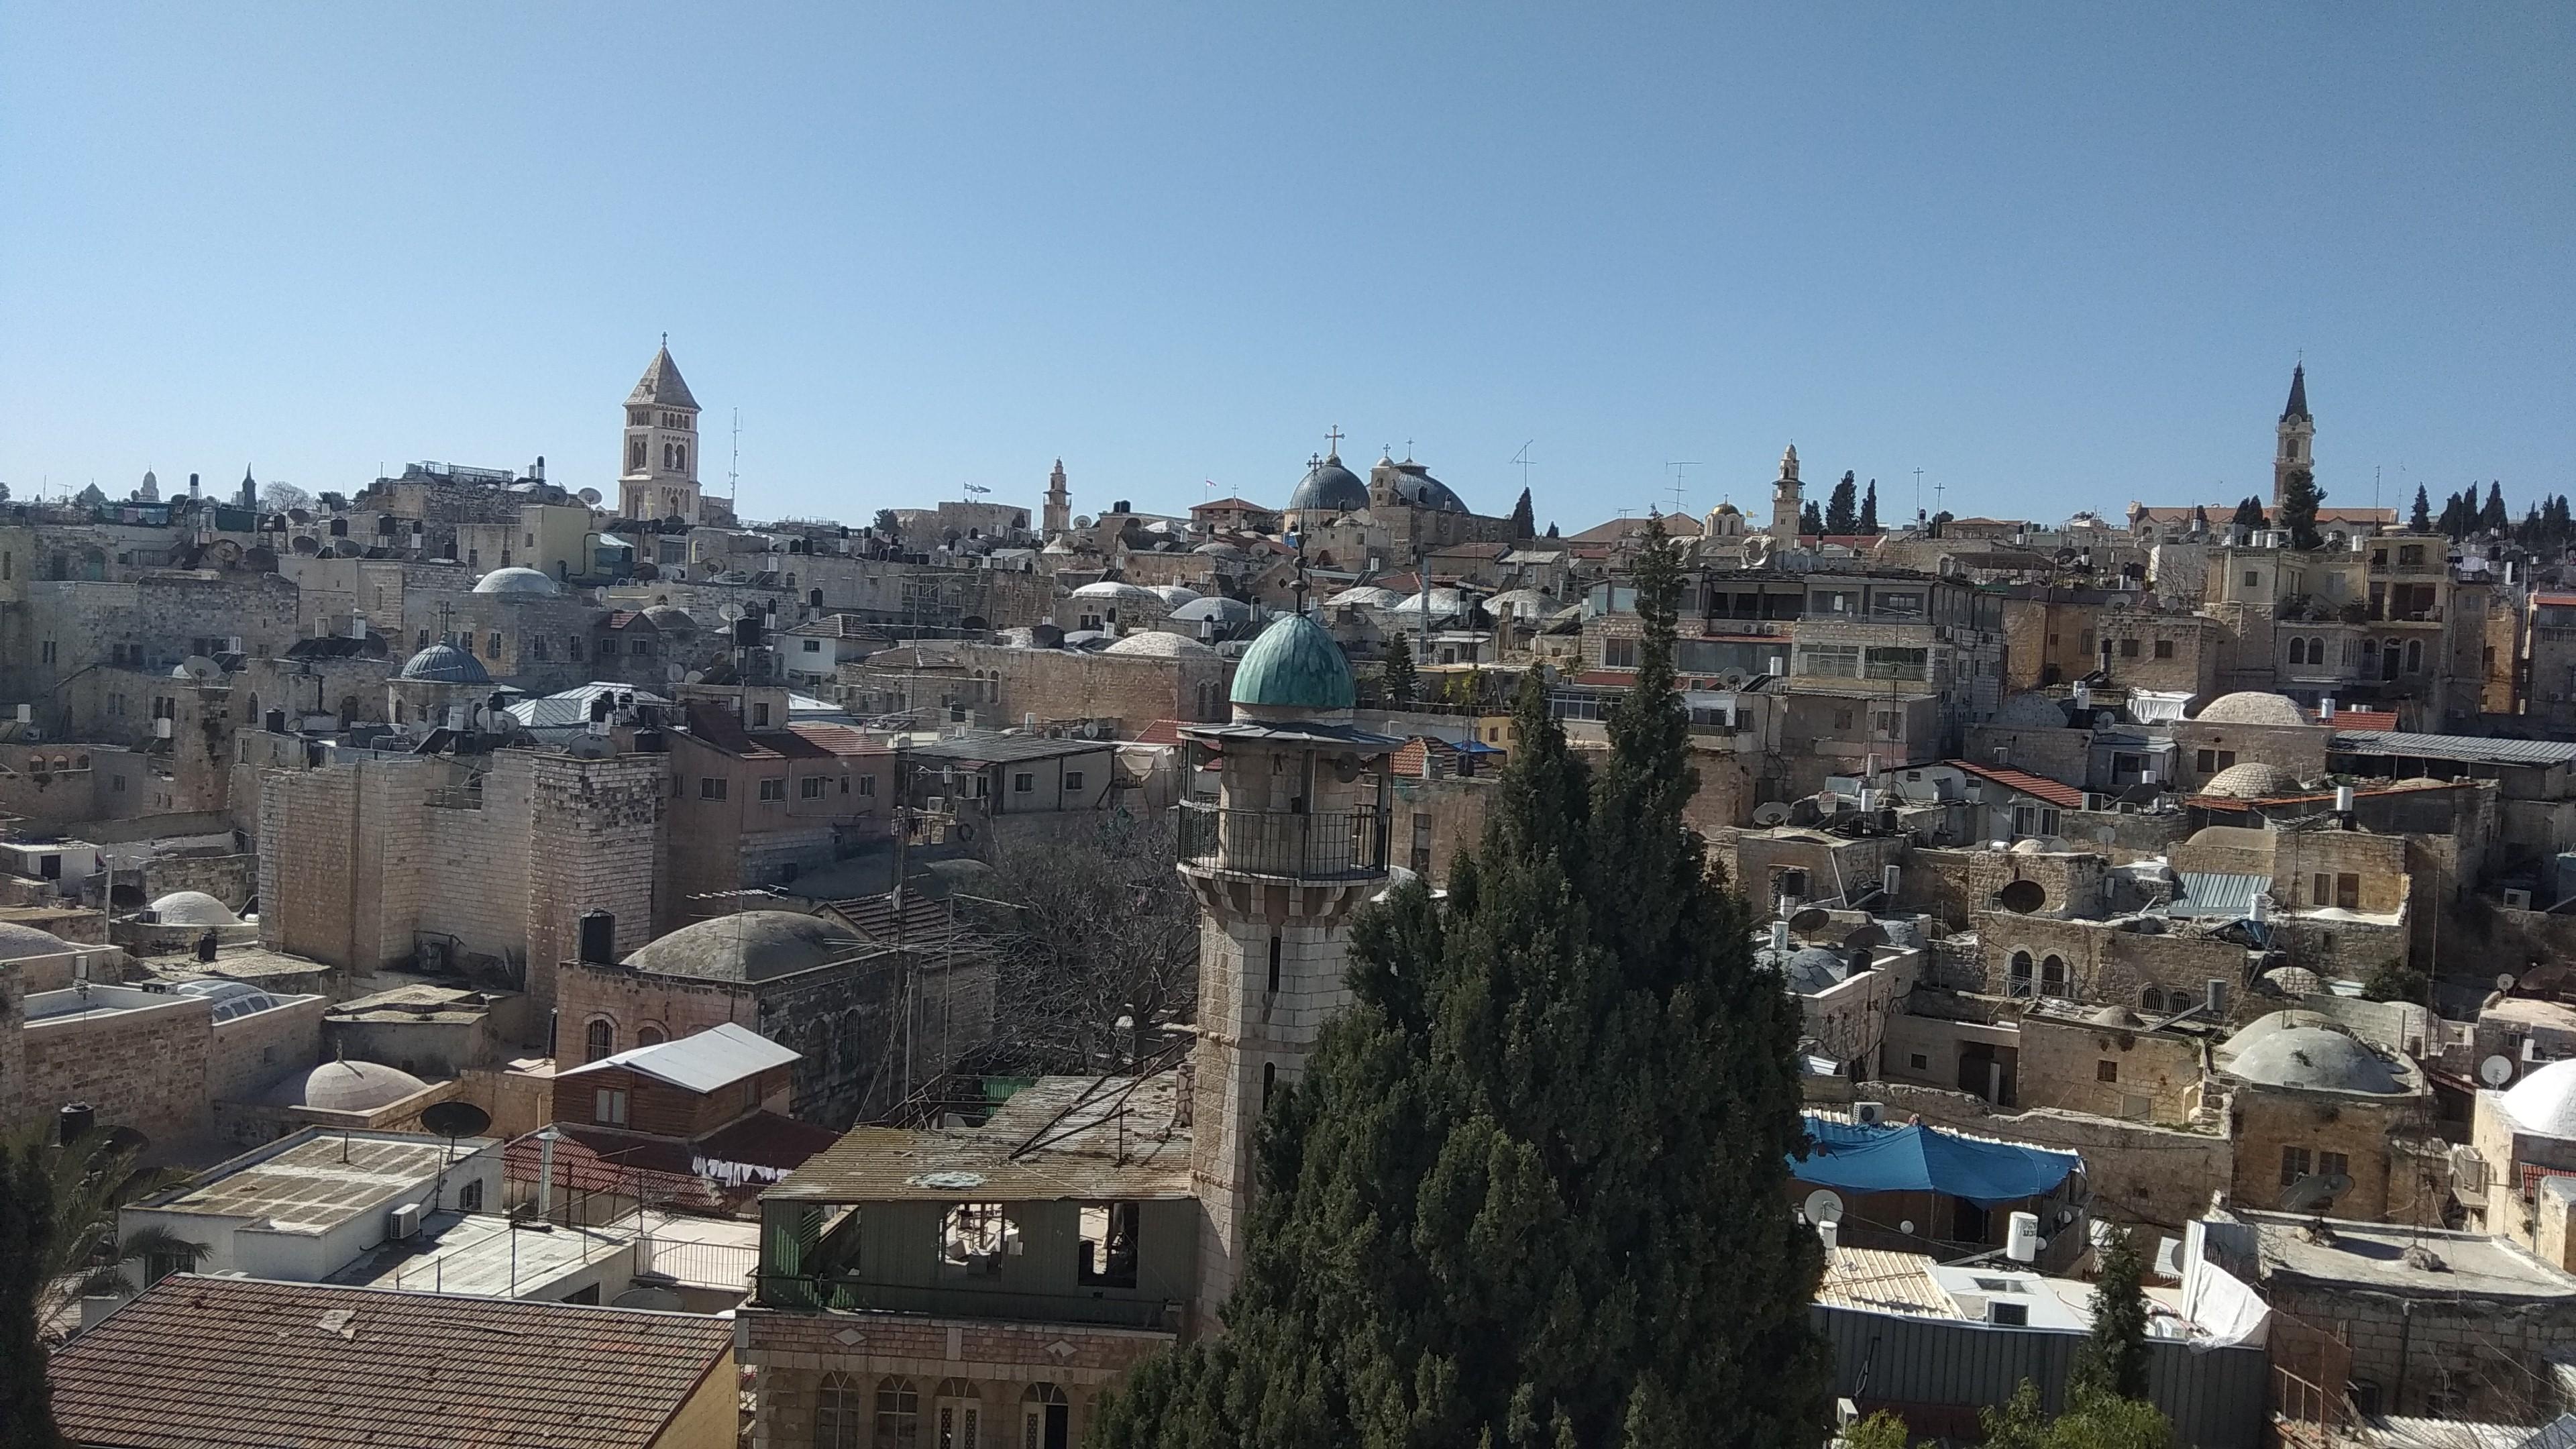 jeruzsalemi_latkep_az_evangelikus_templommal_bal_oldalt_vastag_tornyu.jpg